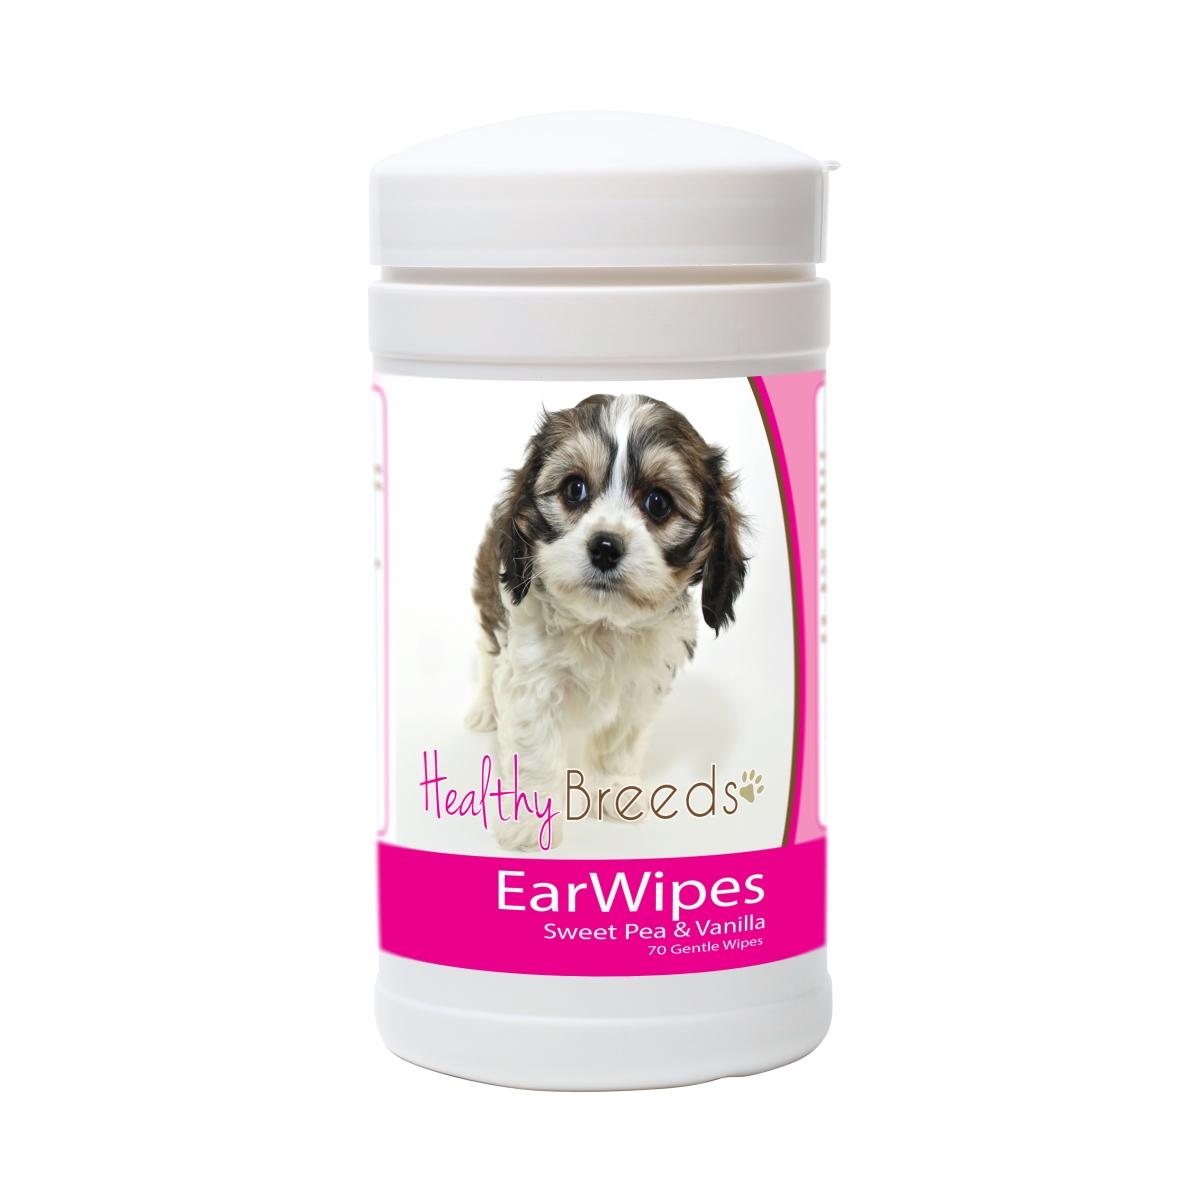 Healthy Breeds 840235175575 Cavachon Ear Wipes - 70 Count